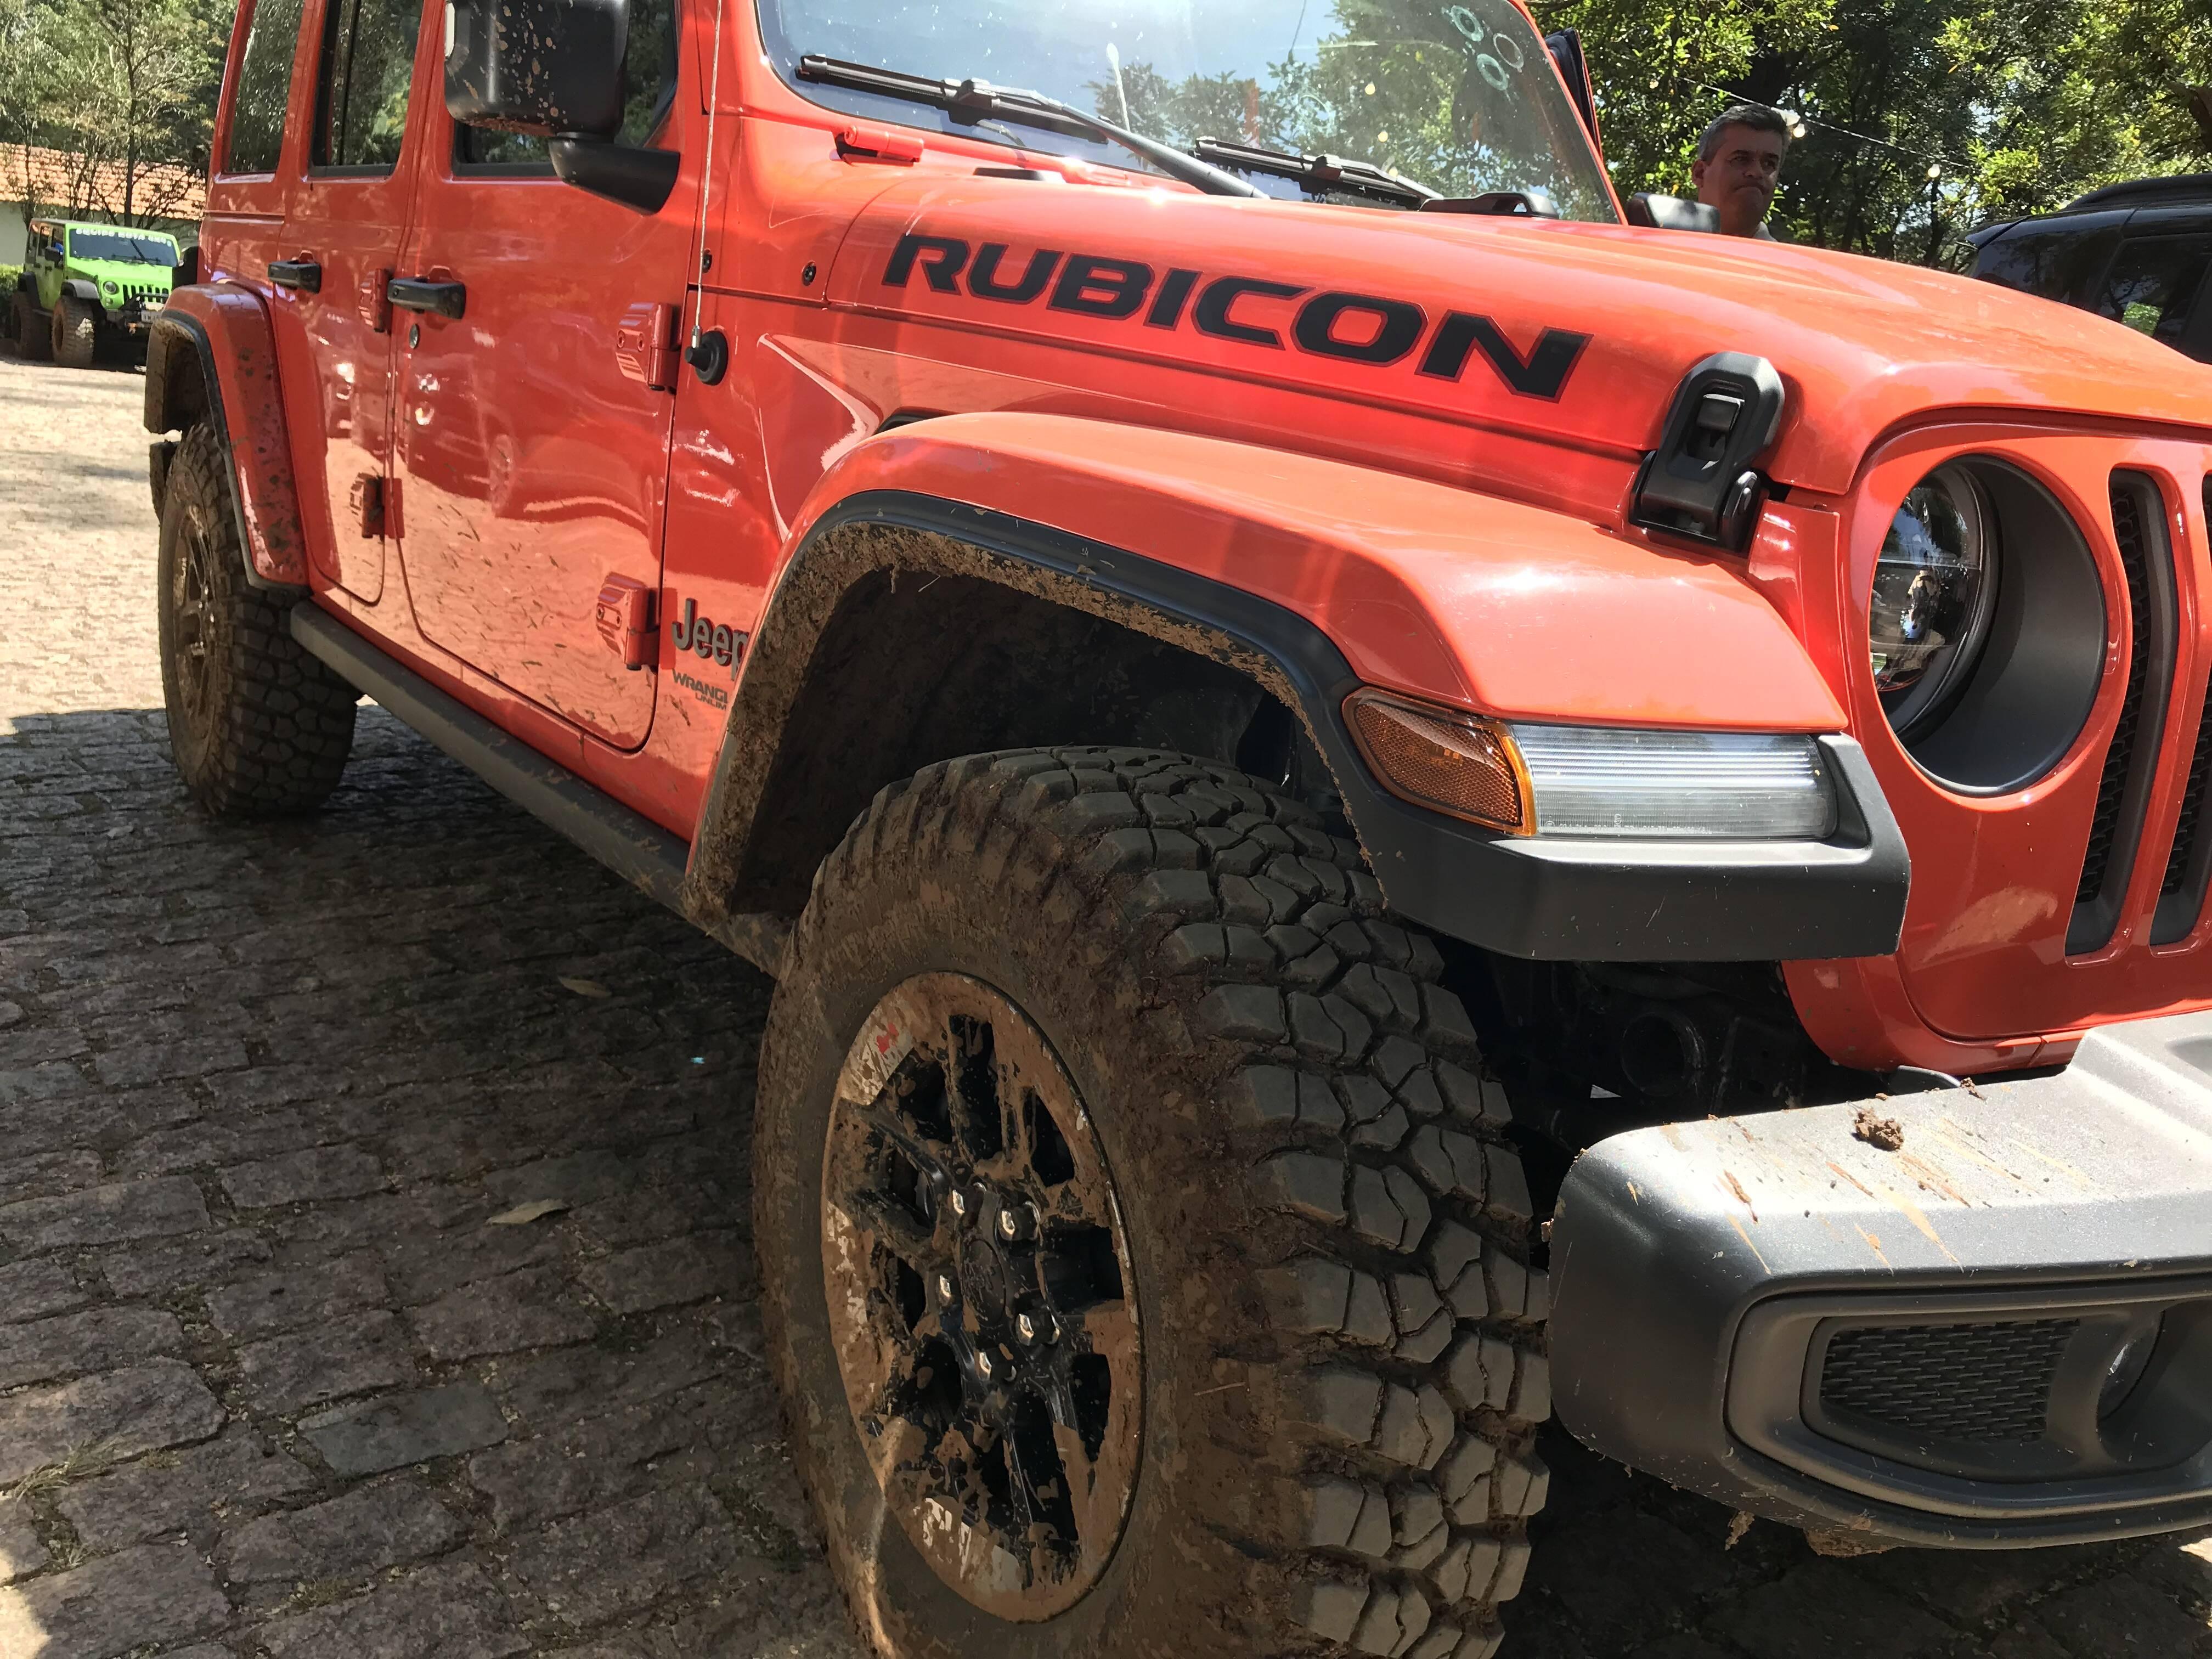 Jeep Wrangler. Foto: Guilherme Menezes/iG